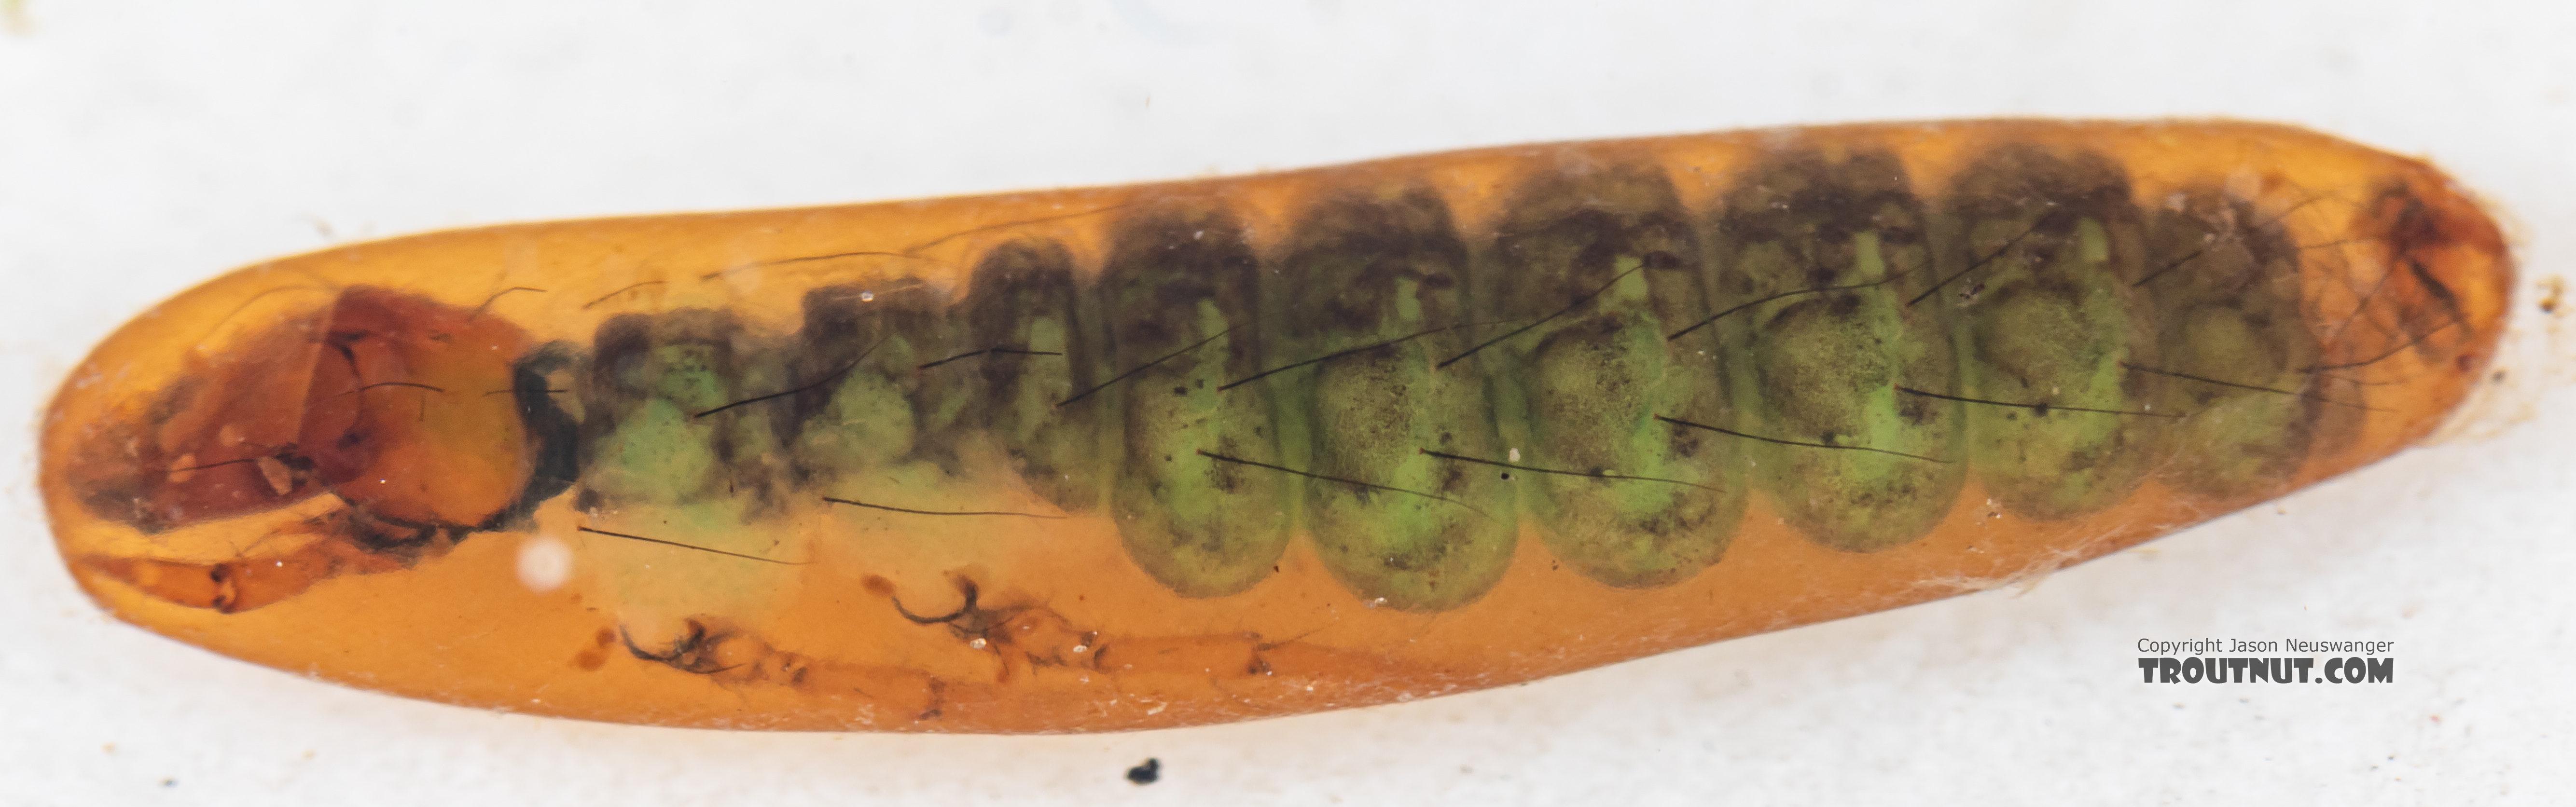 Rhyacophila (Green Sedges) Caddisfly Pupa from Mystery Creek #199 in Washington